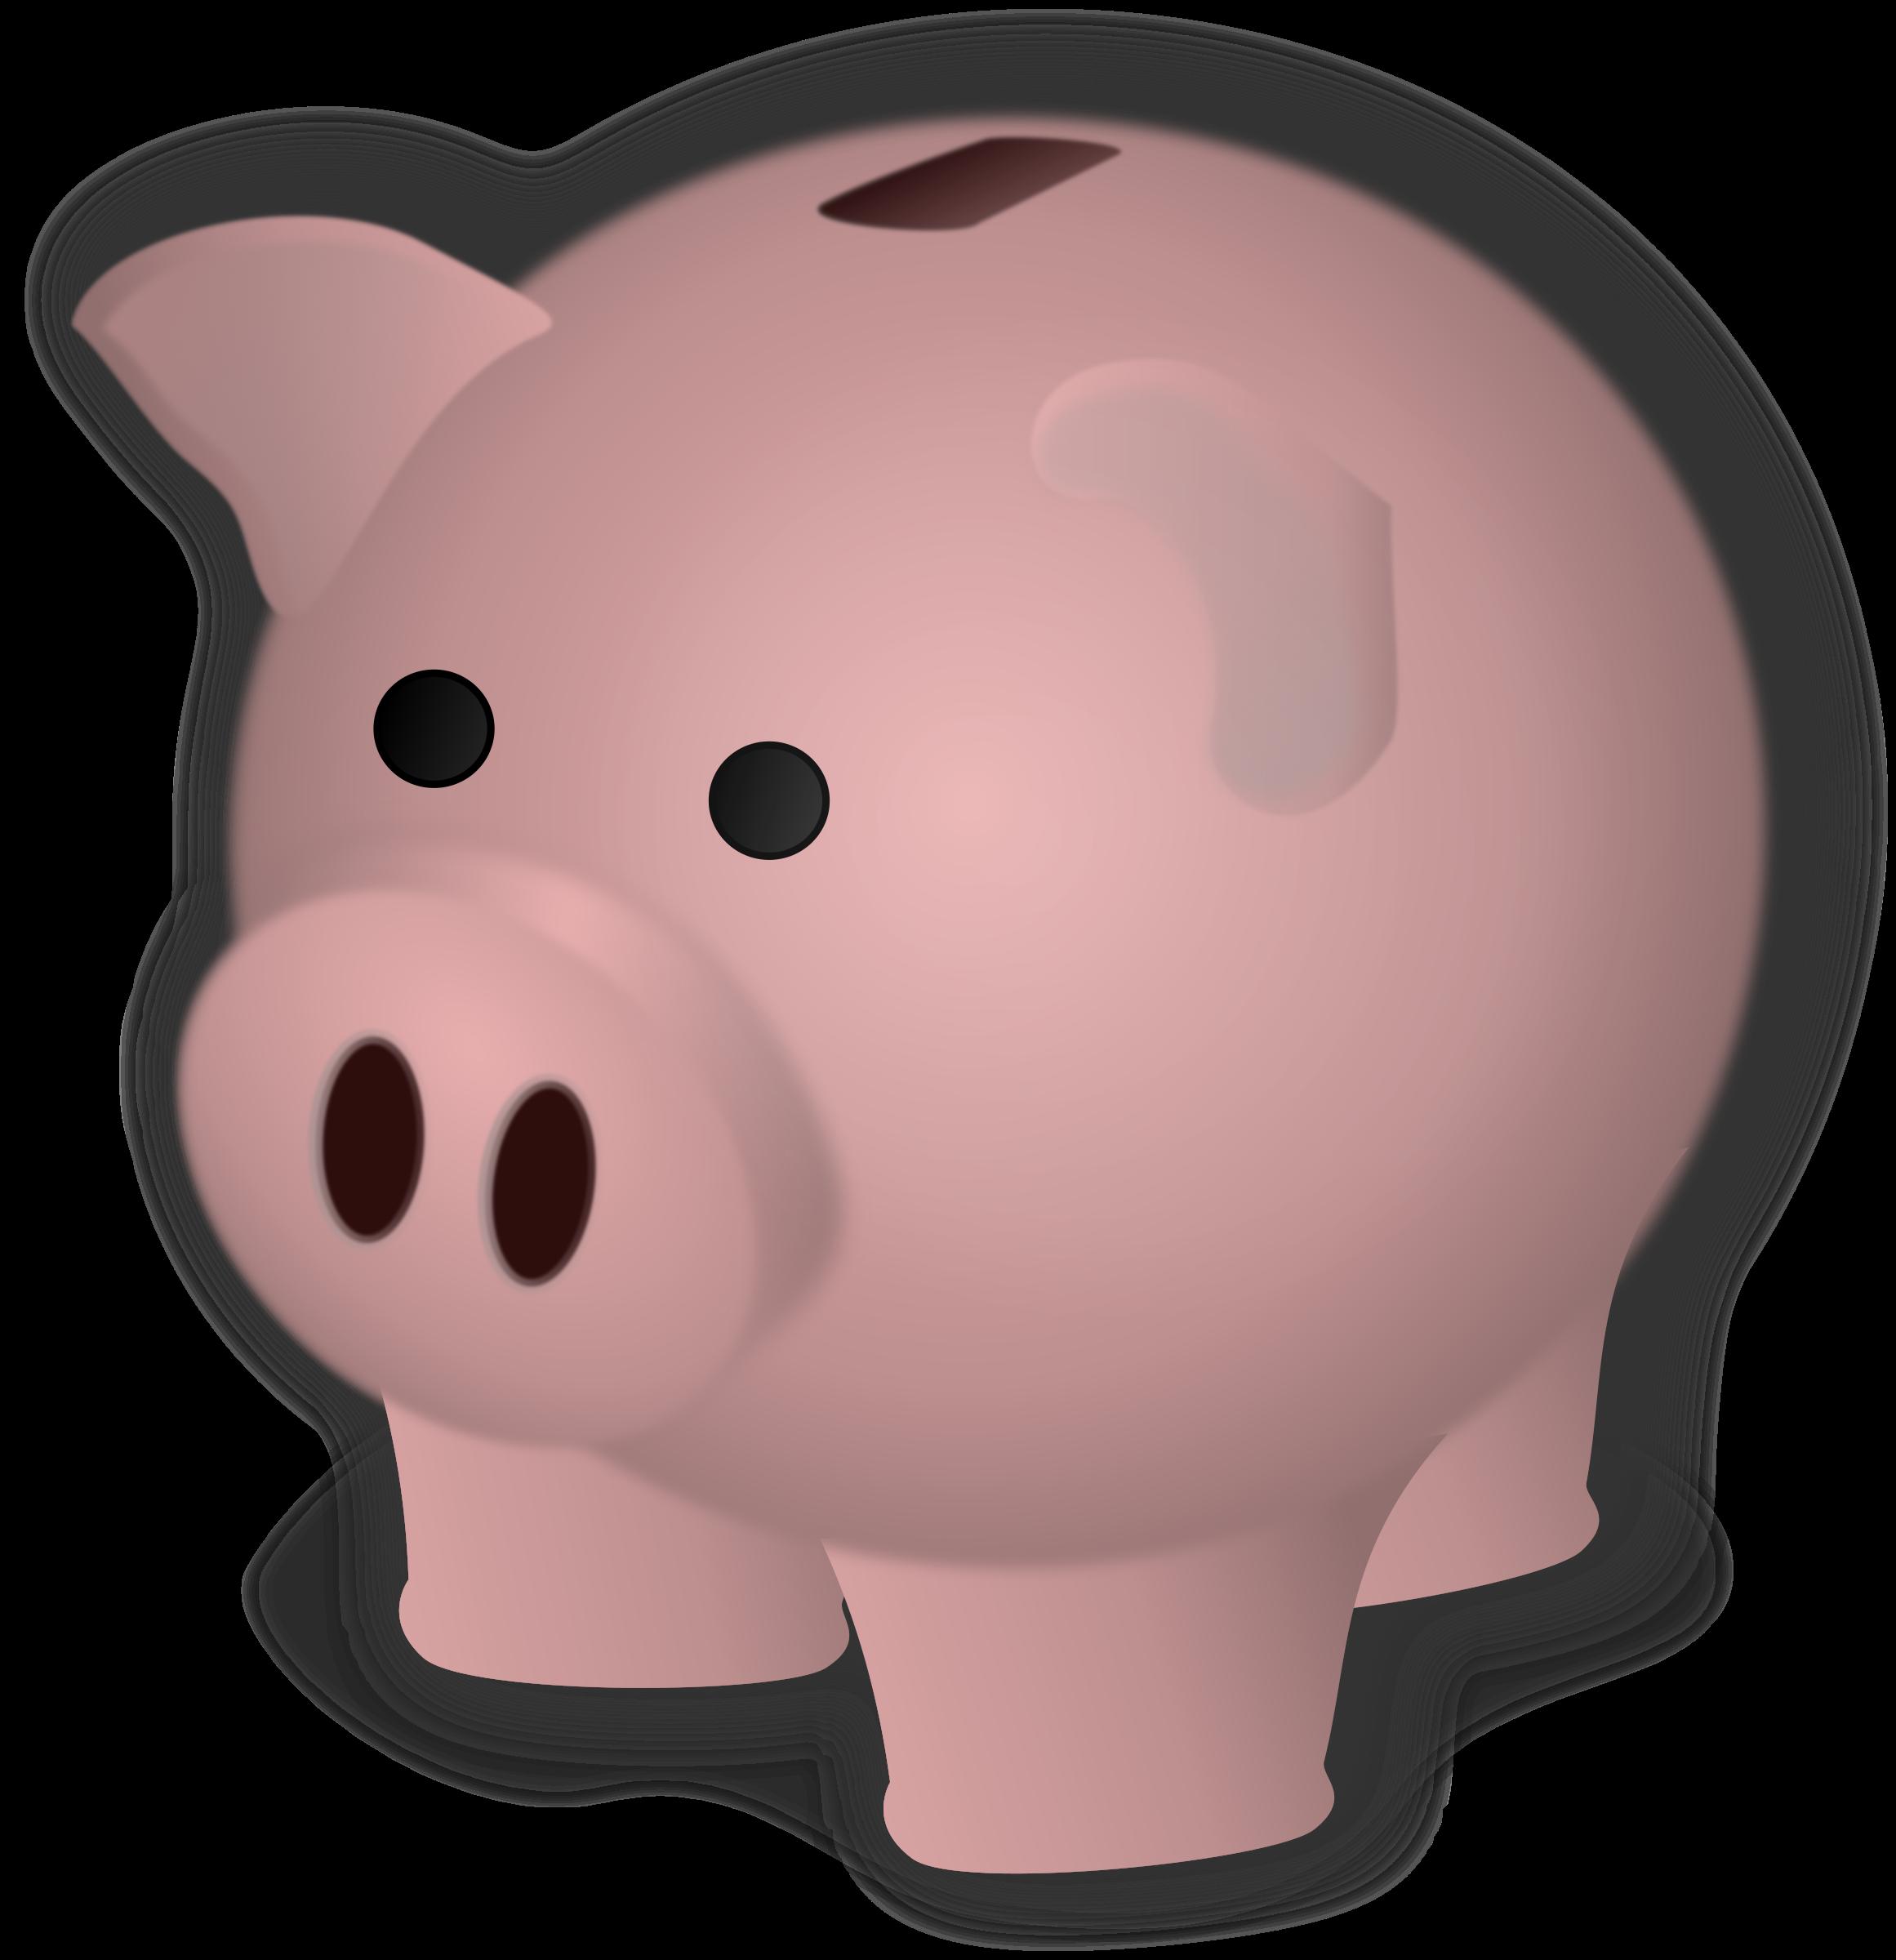 Piggybank by Mogwai